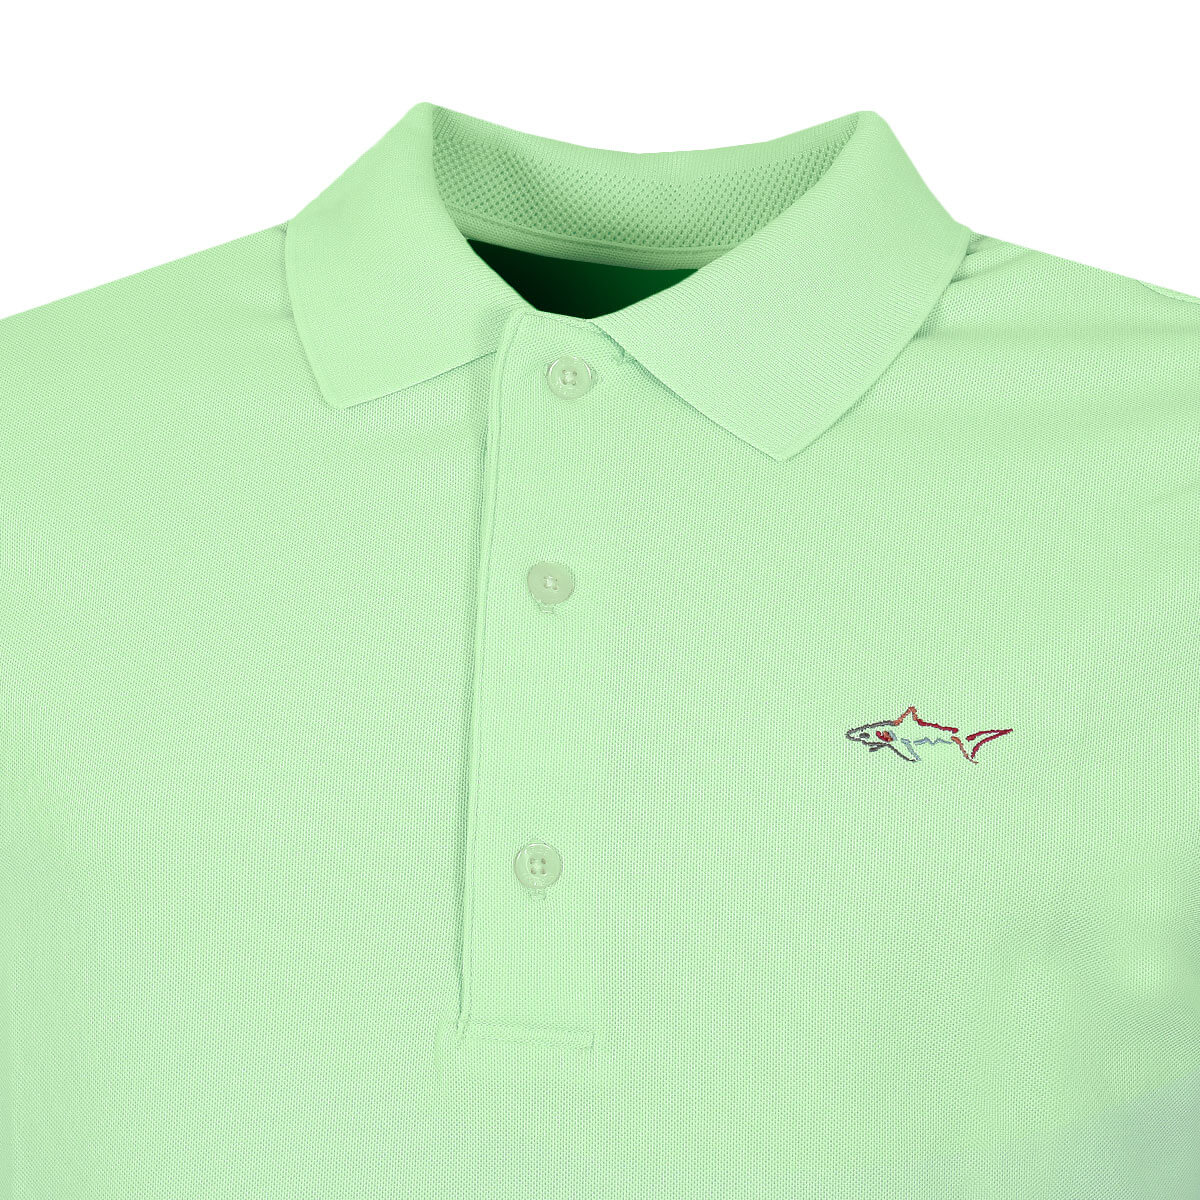 Greg-Norman-Mens-KX04-Performance-Micro-Pique-Golf-Polo-Shirt-28-OFF-RRP thumbnail 41